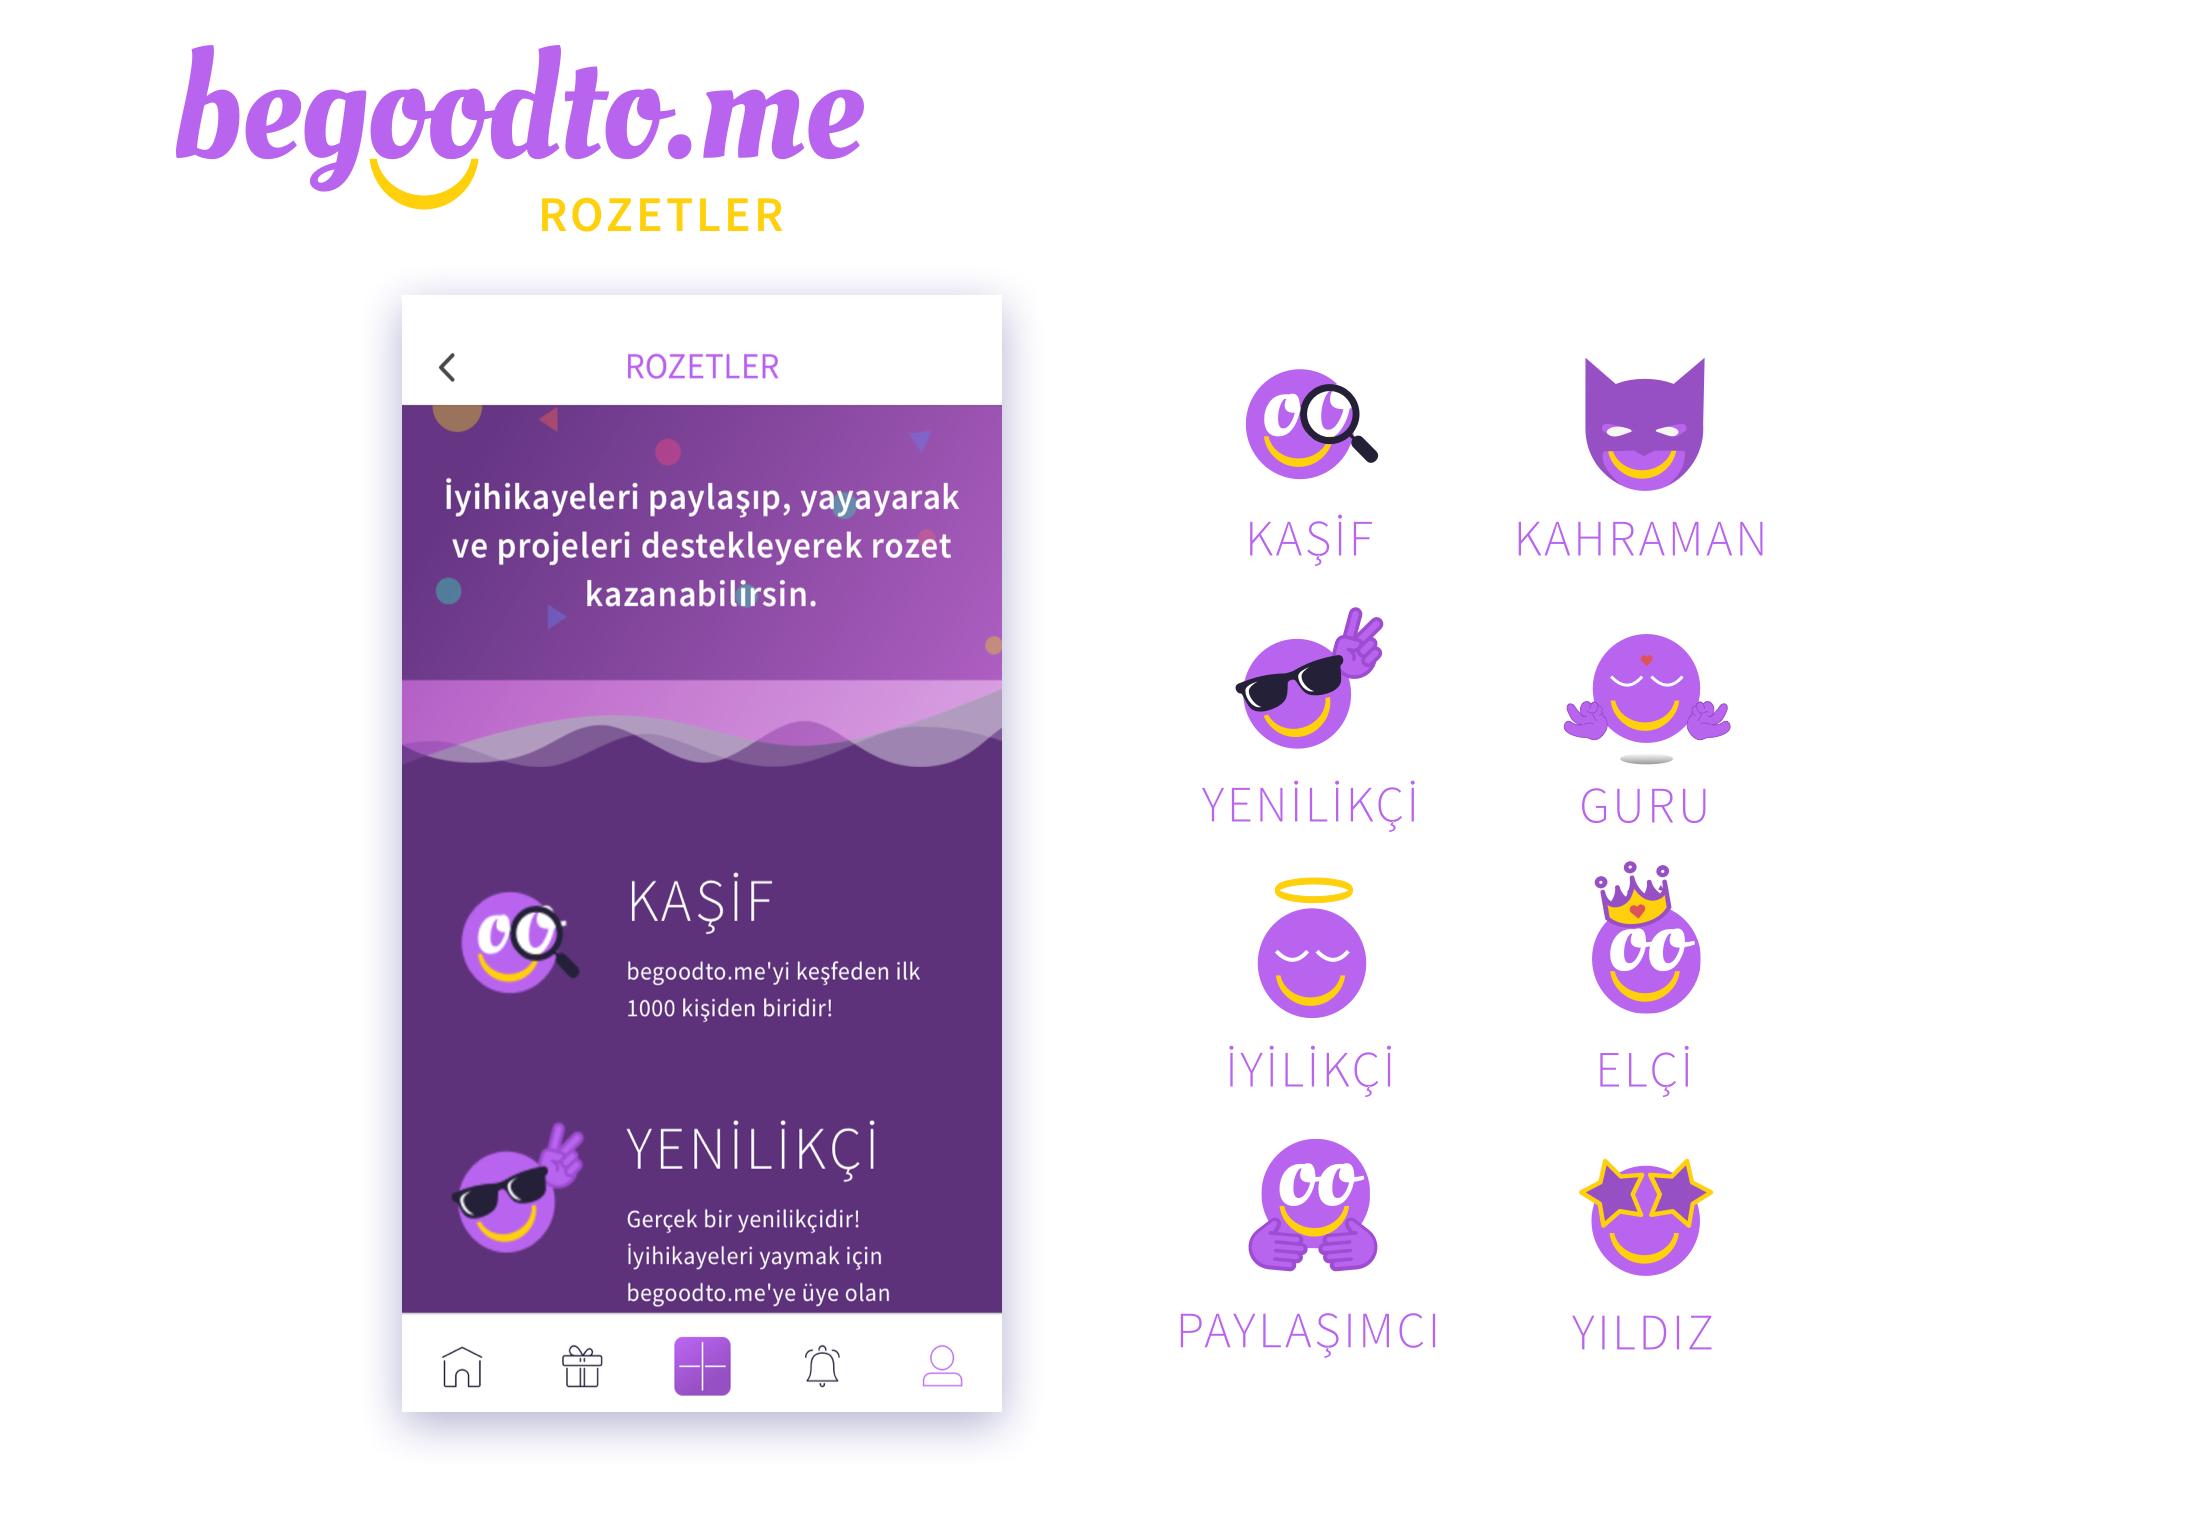 Badge Designs for begoodto.me